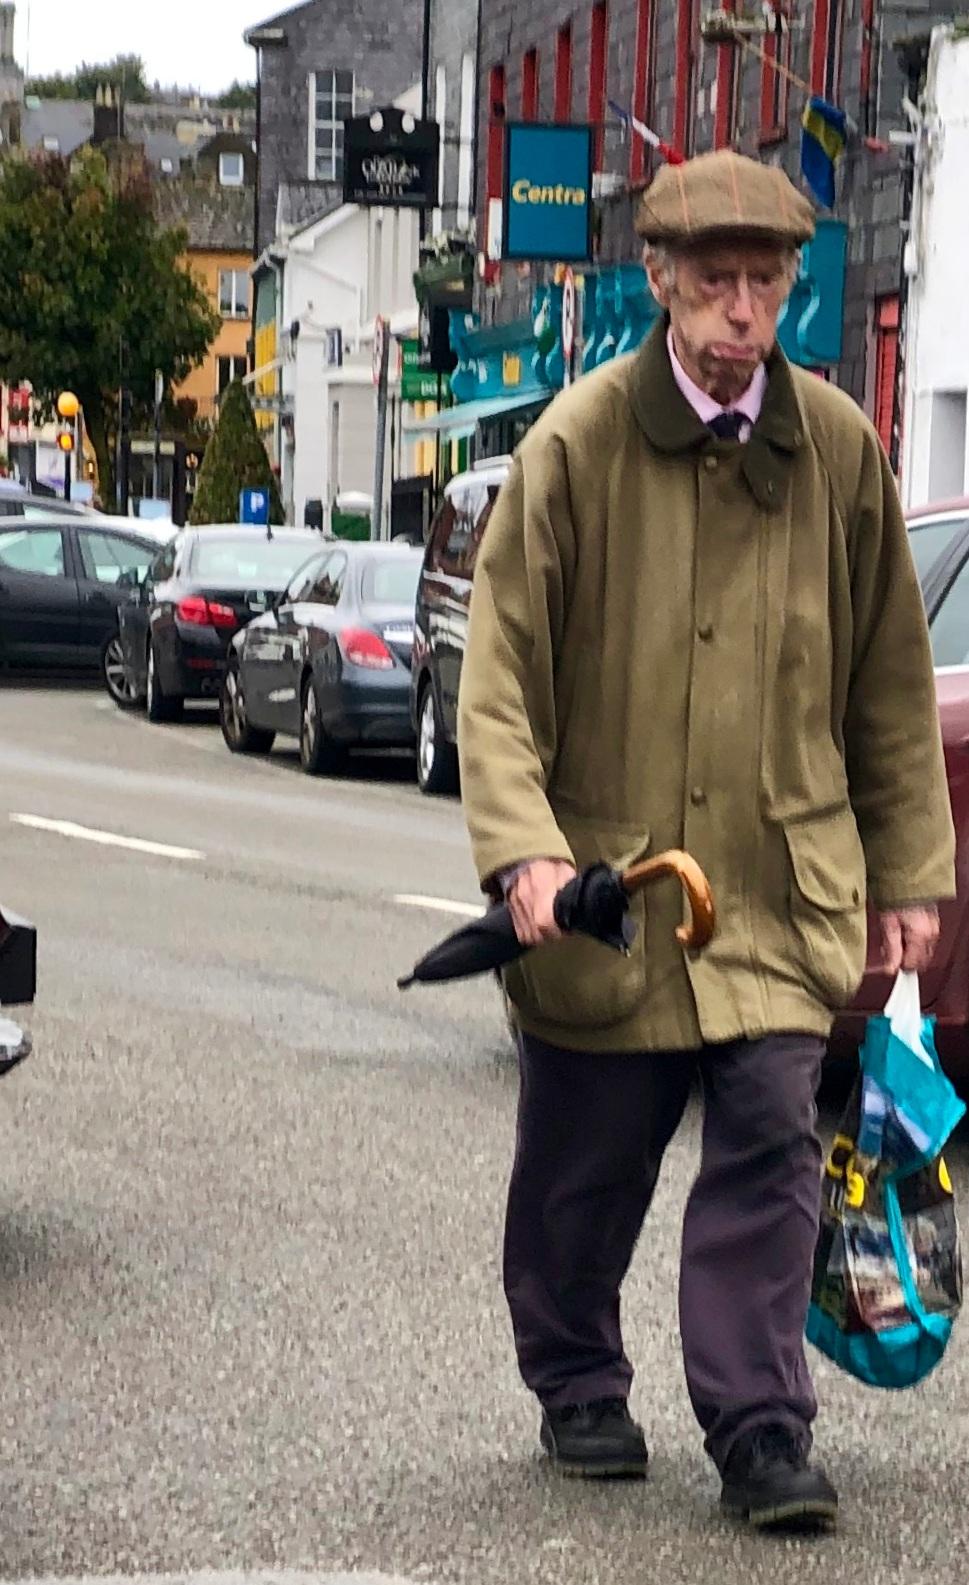 Random Irish Man - Lovely man walking in Kinsale, Ireland.iPhone XS Max